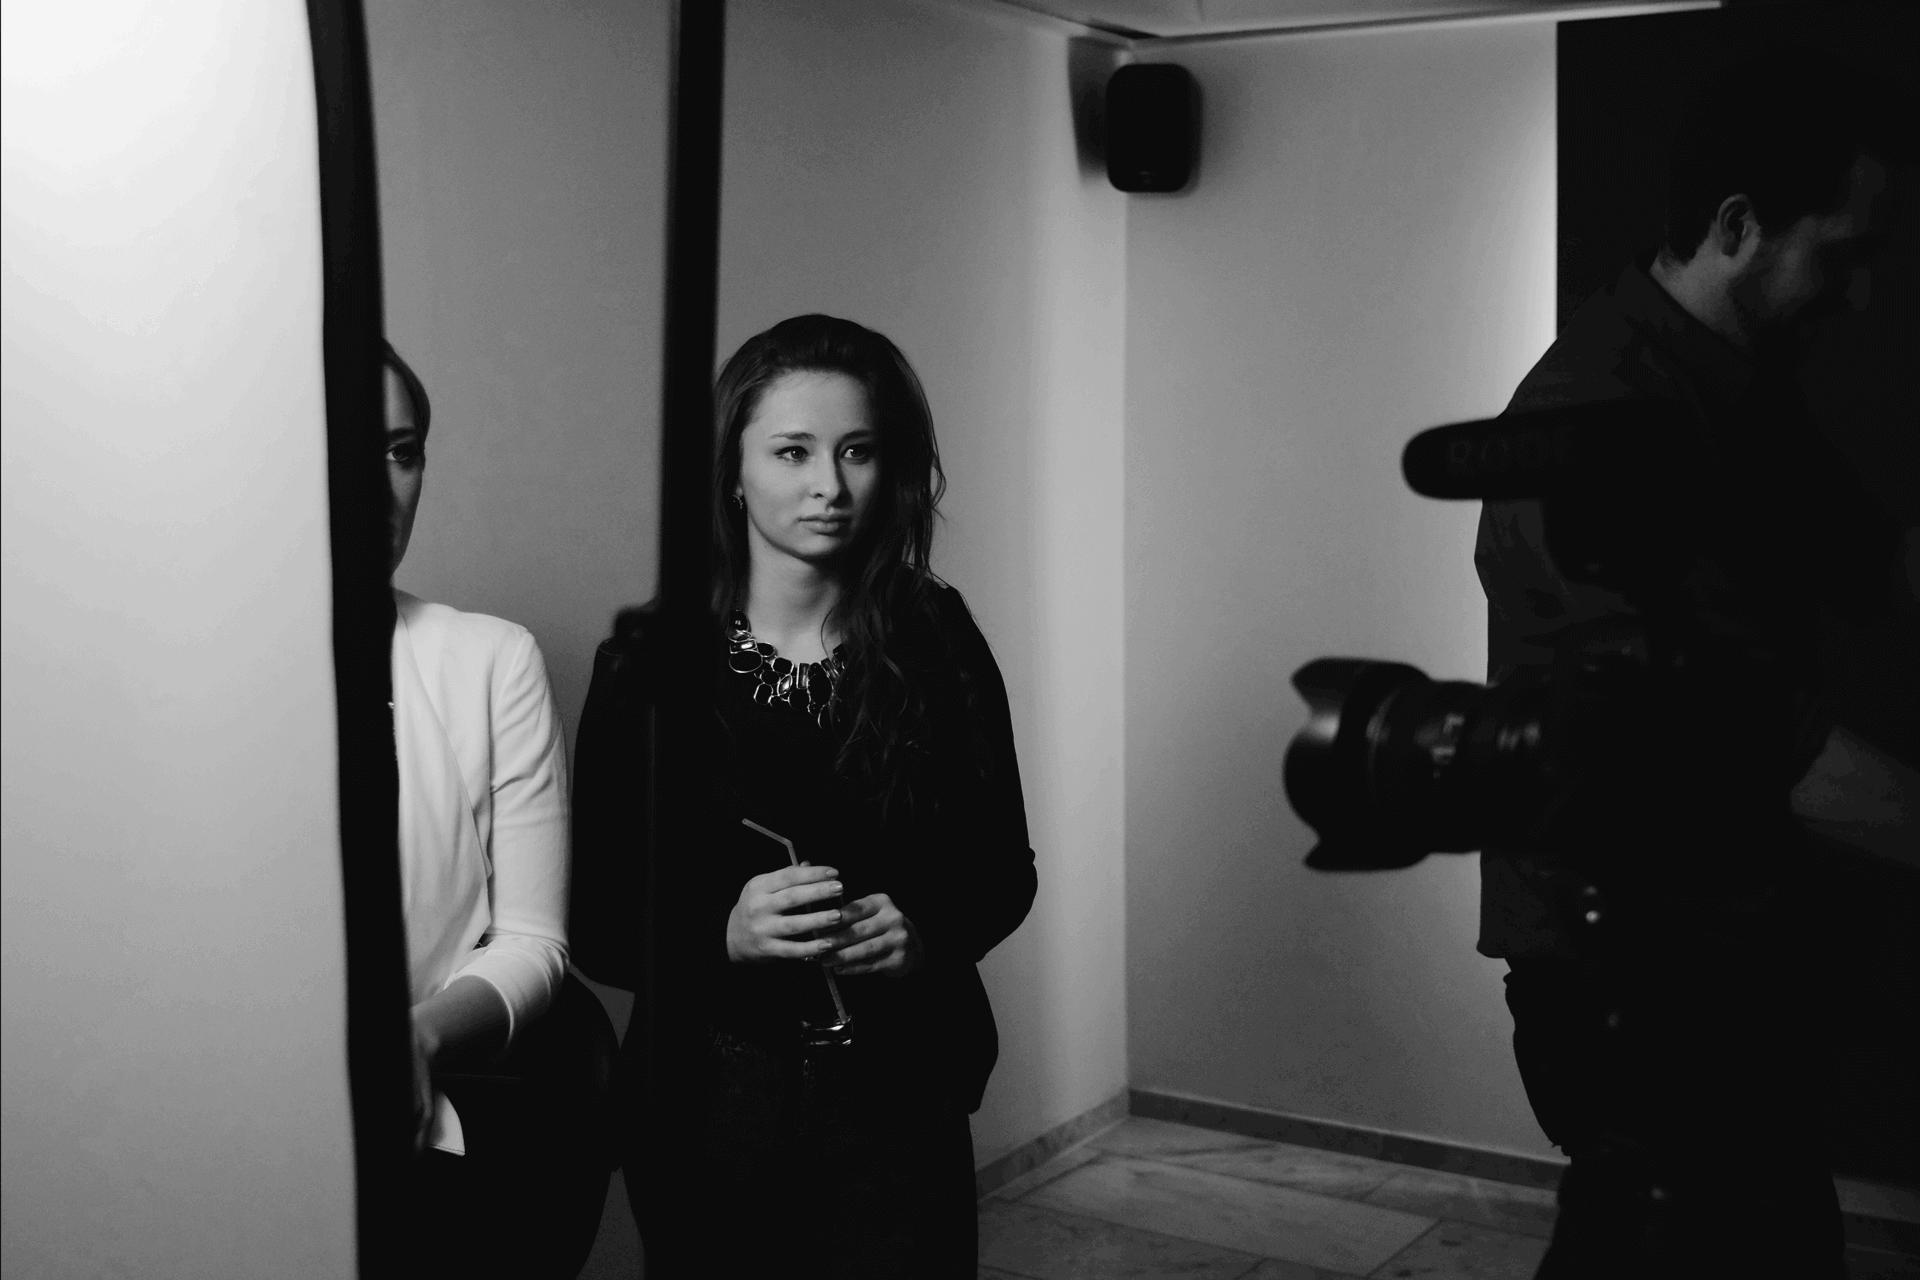 Julija organisiert das Fotoshooting bei PAVO